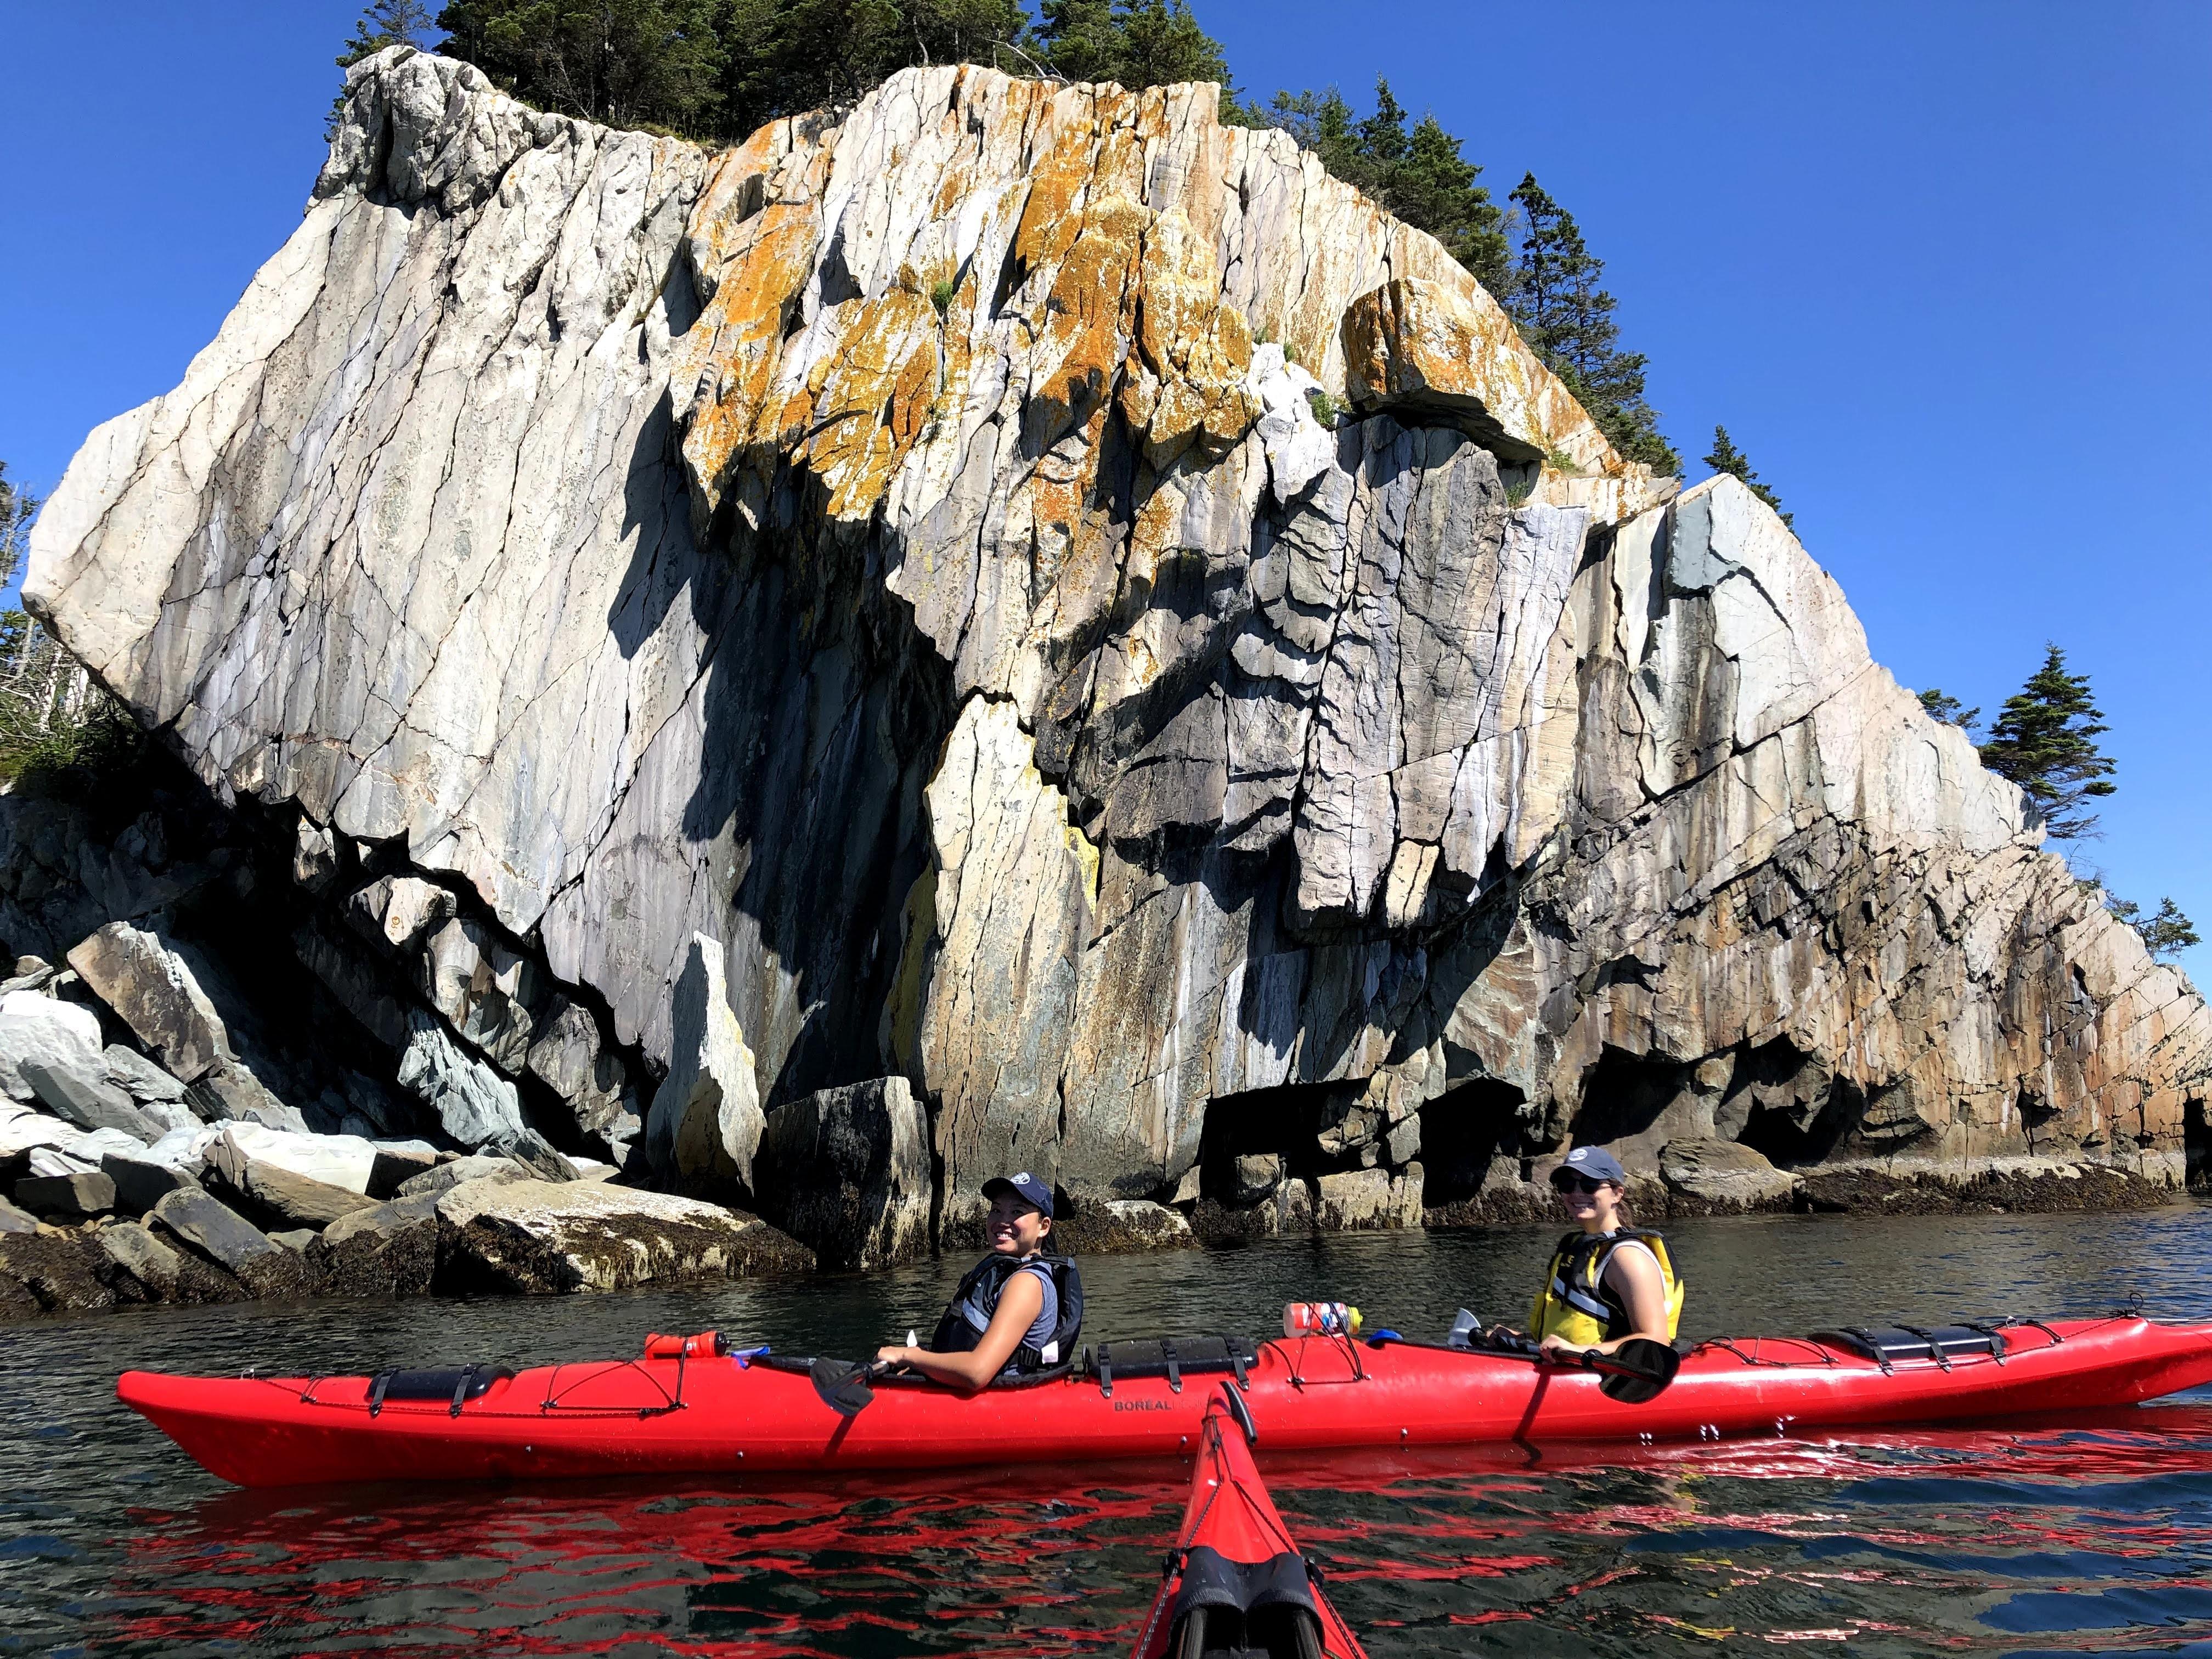 Wild Islands, double kayak, sea kayaks, tandem, rental kayak, ocean kayak tour